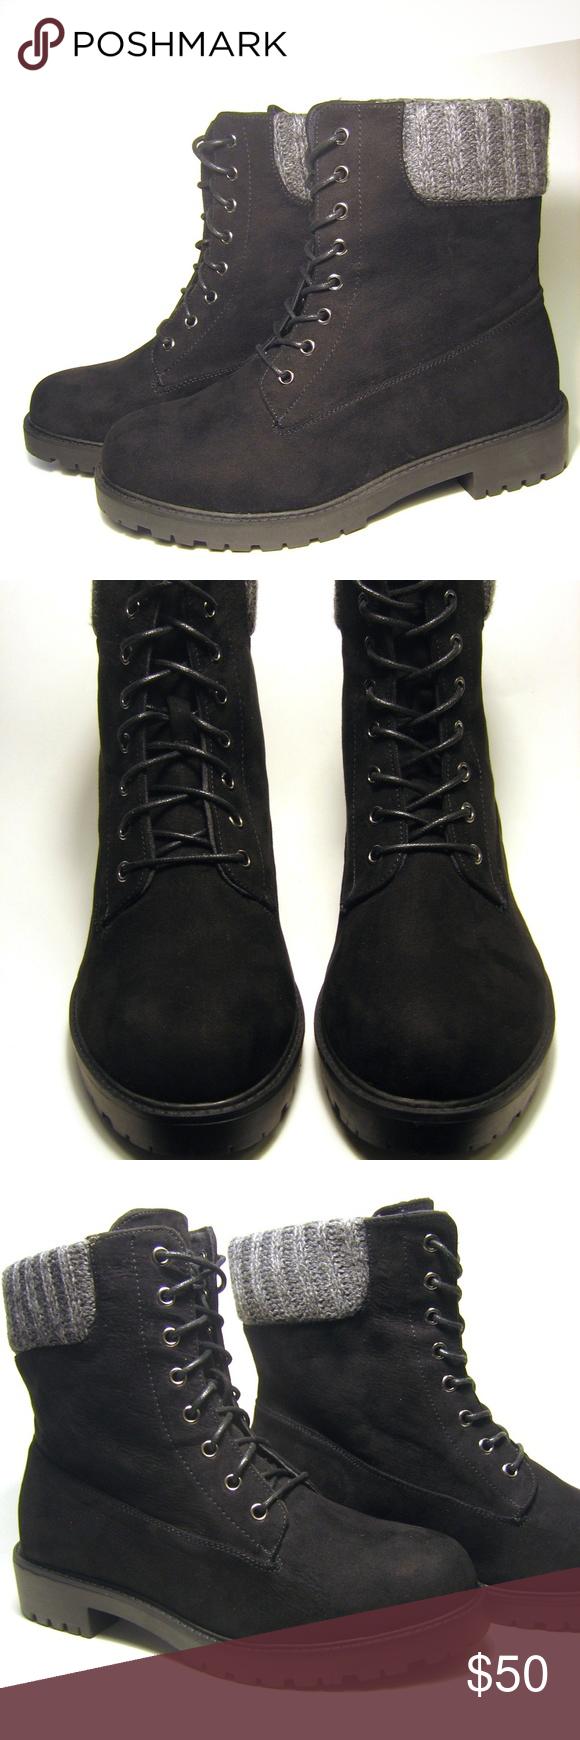 8c578cca2b17 NWOB 9 Wide Torrid Black Combat Boots Brand New Without Box. Never Worn!  Torrid s